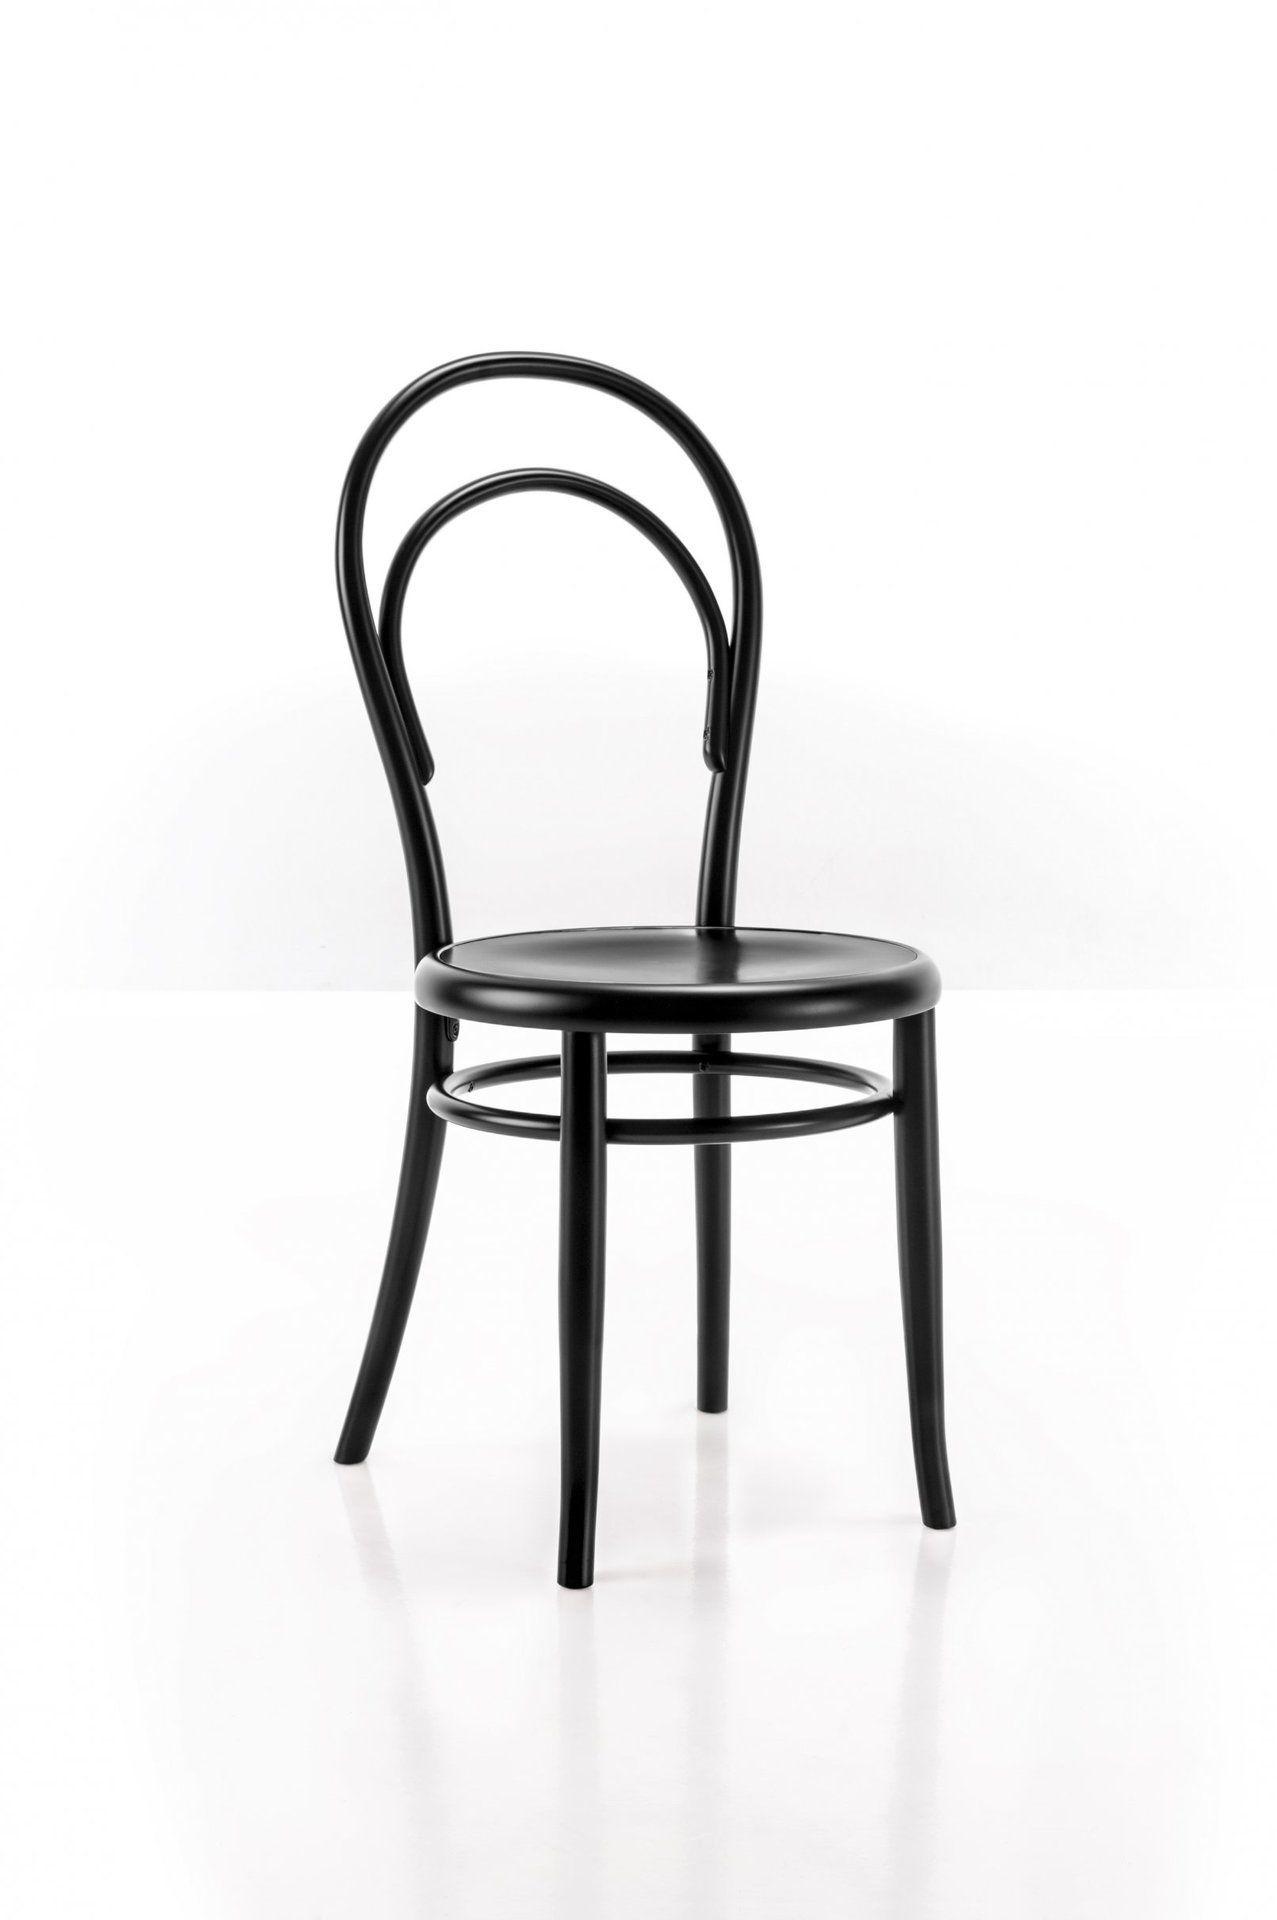 Chair N. 14 By Michael Thonet (1860) For Gebrüder Thonet Vienna